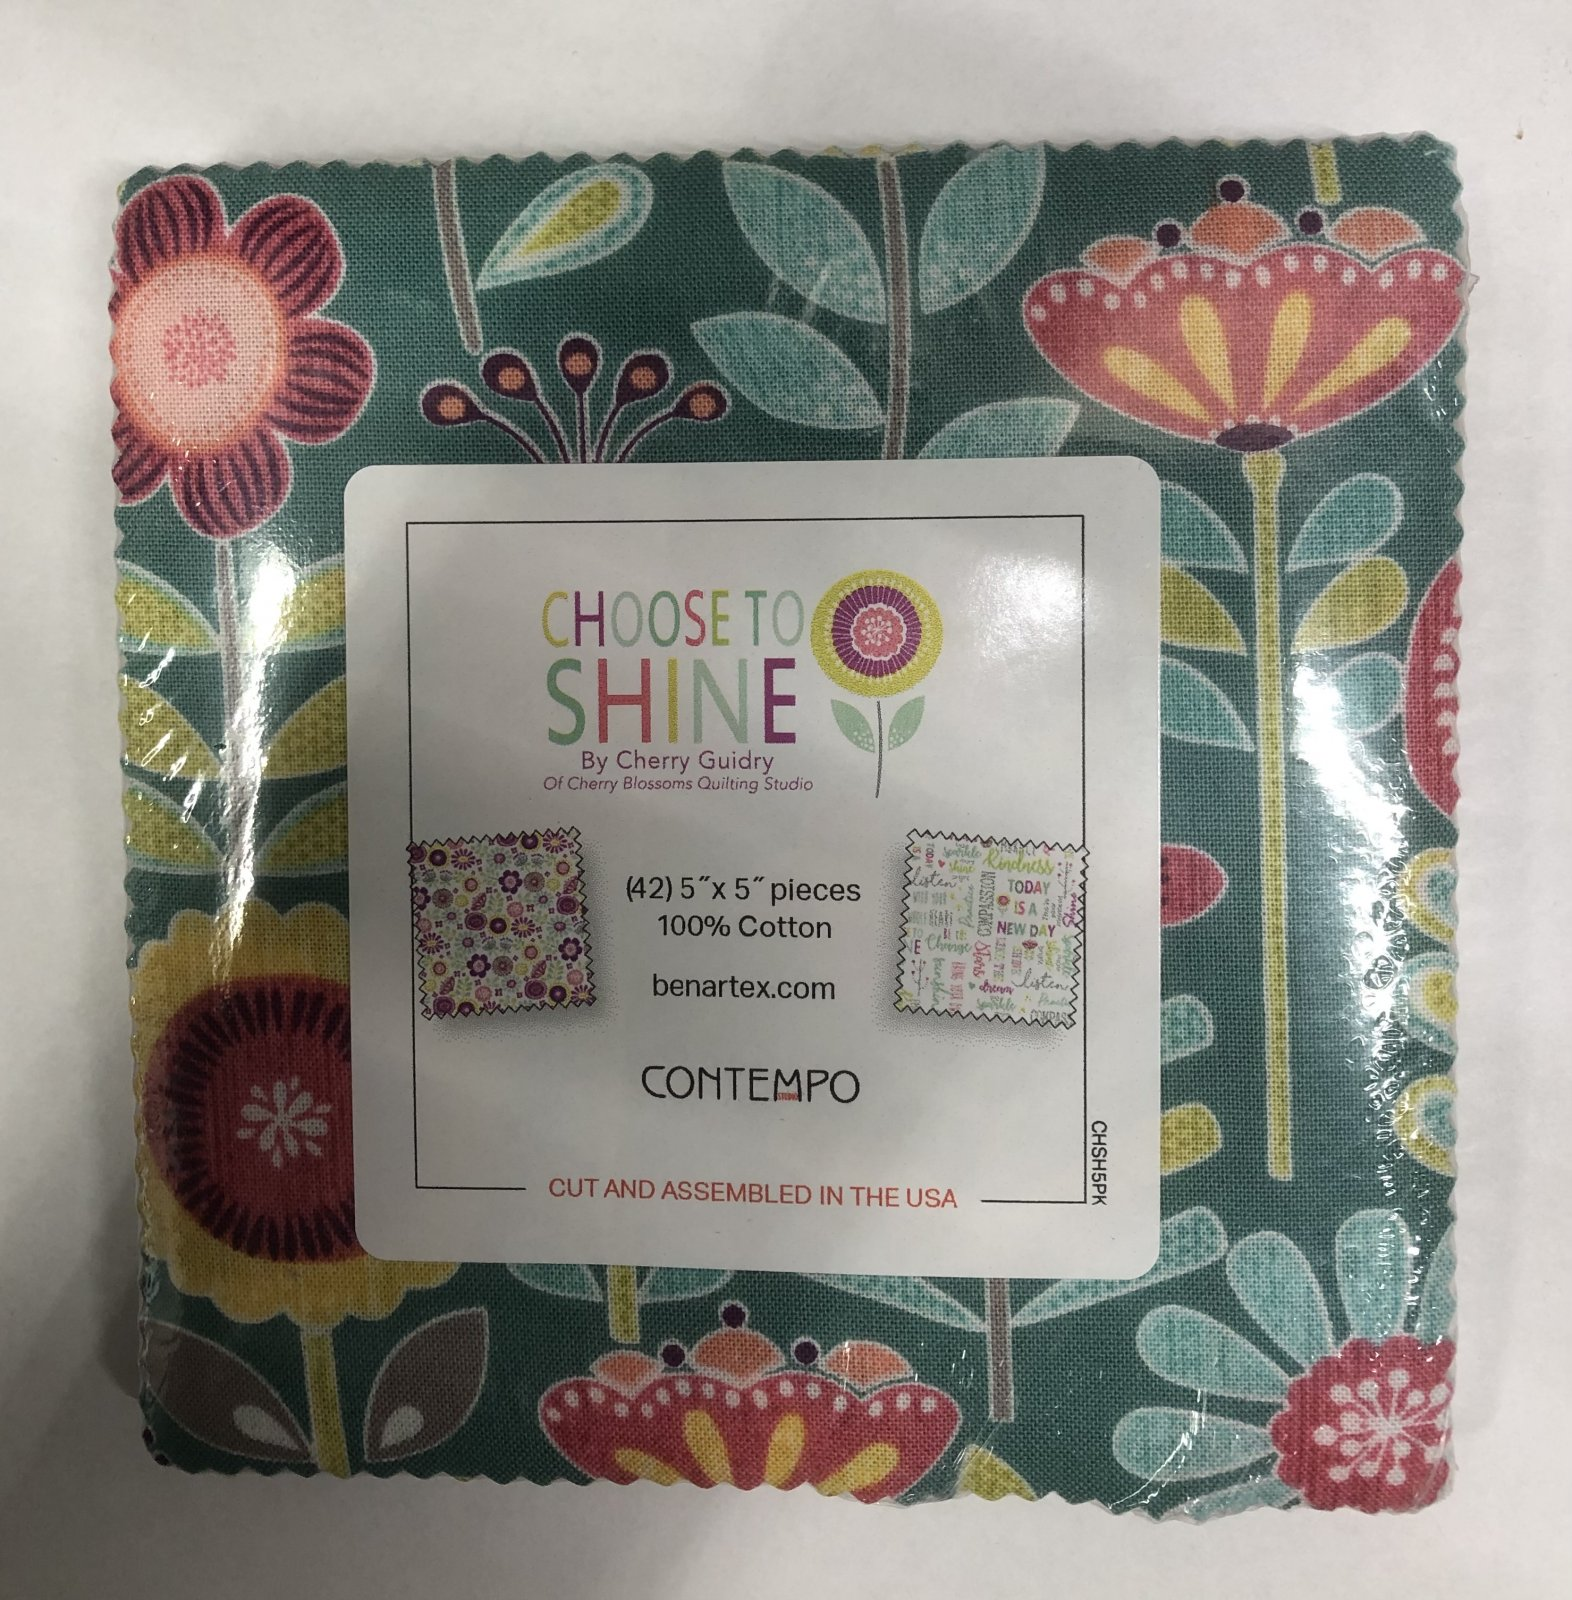 Choose to Shine:  5 x 5 Squares - 42 piece Fabric Square Pack from Benartex